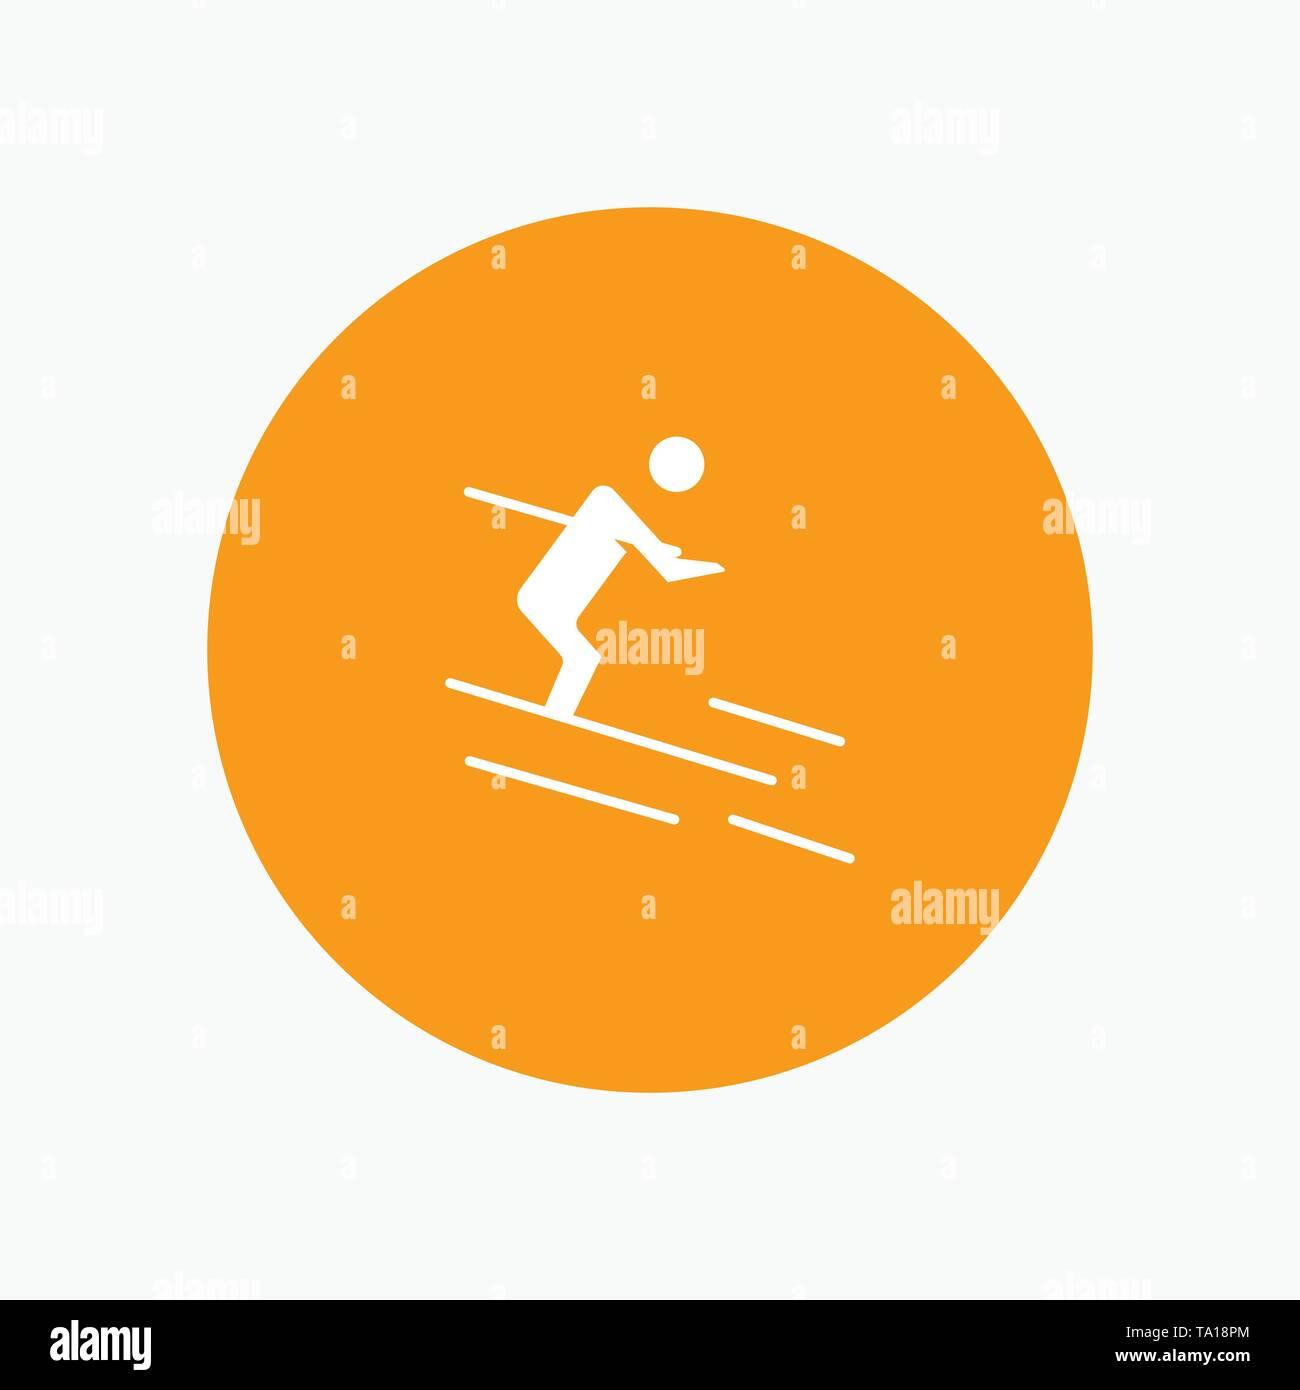 Activity, Ski, Skiing, Sportsman - Stock Image